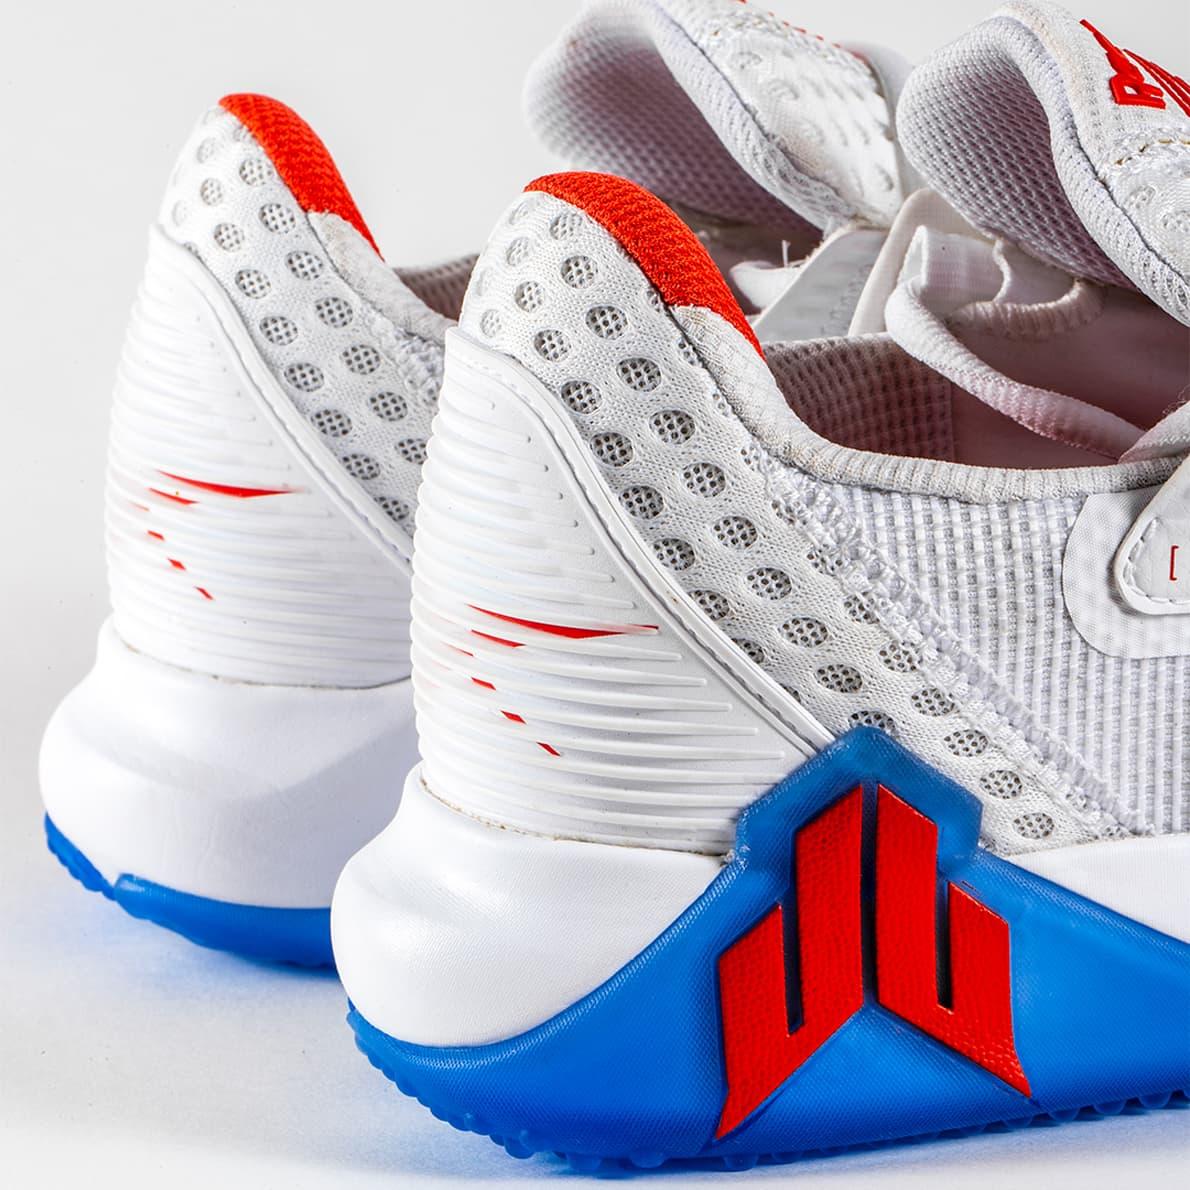 JJ IV Reebok Training Shoe00007